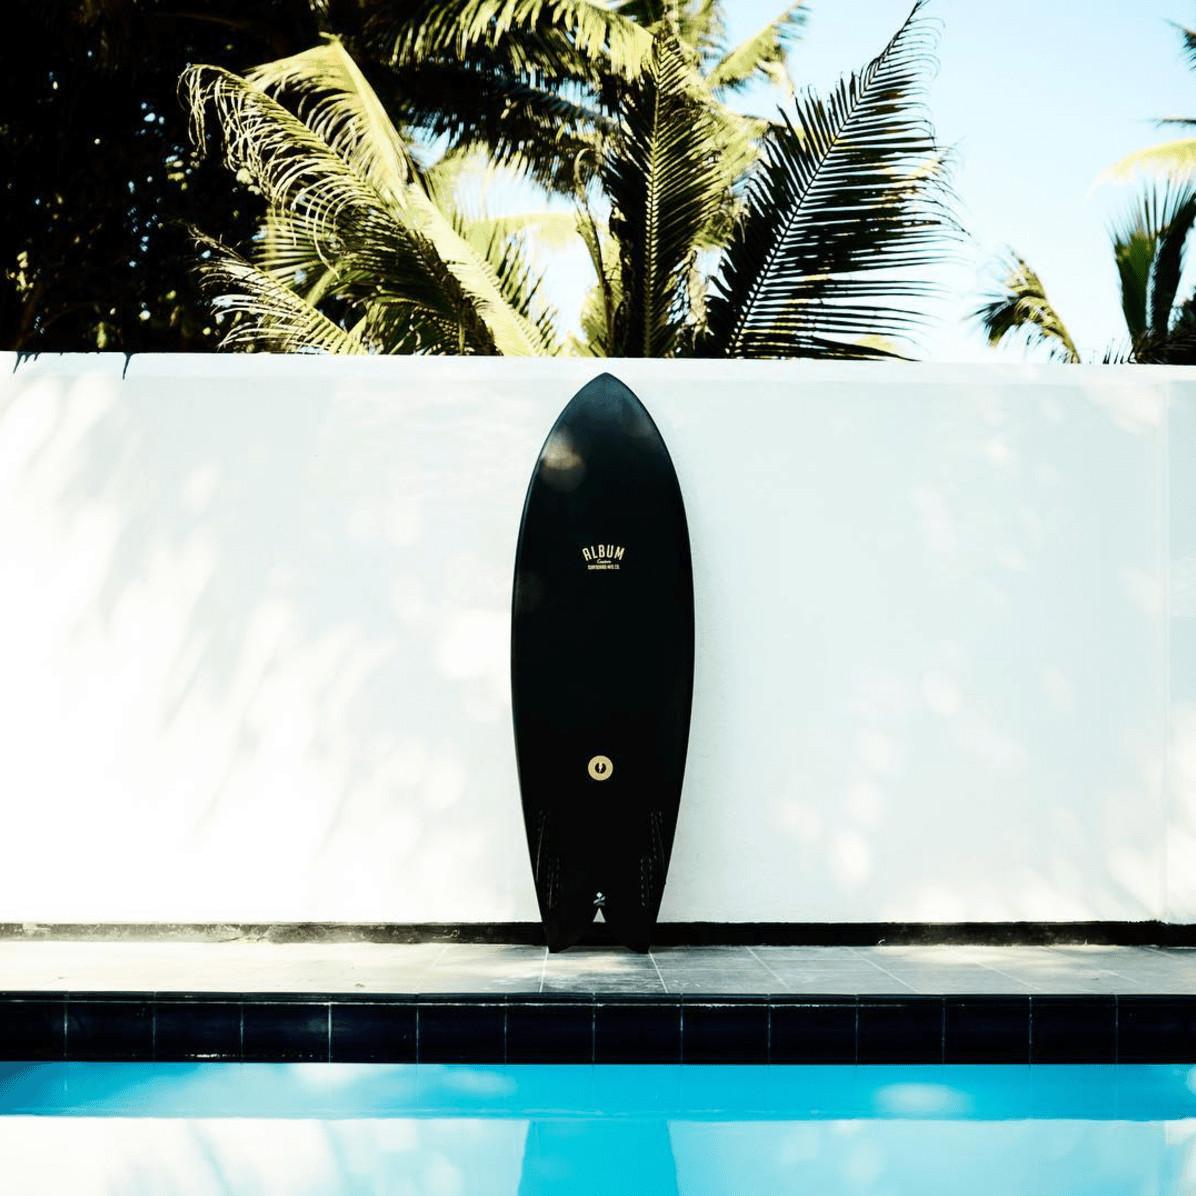 surfboard black album surf